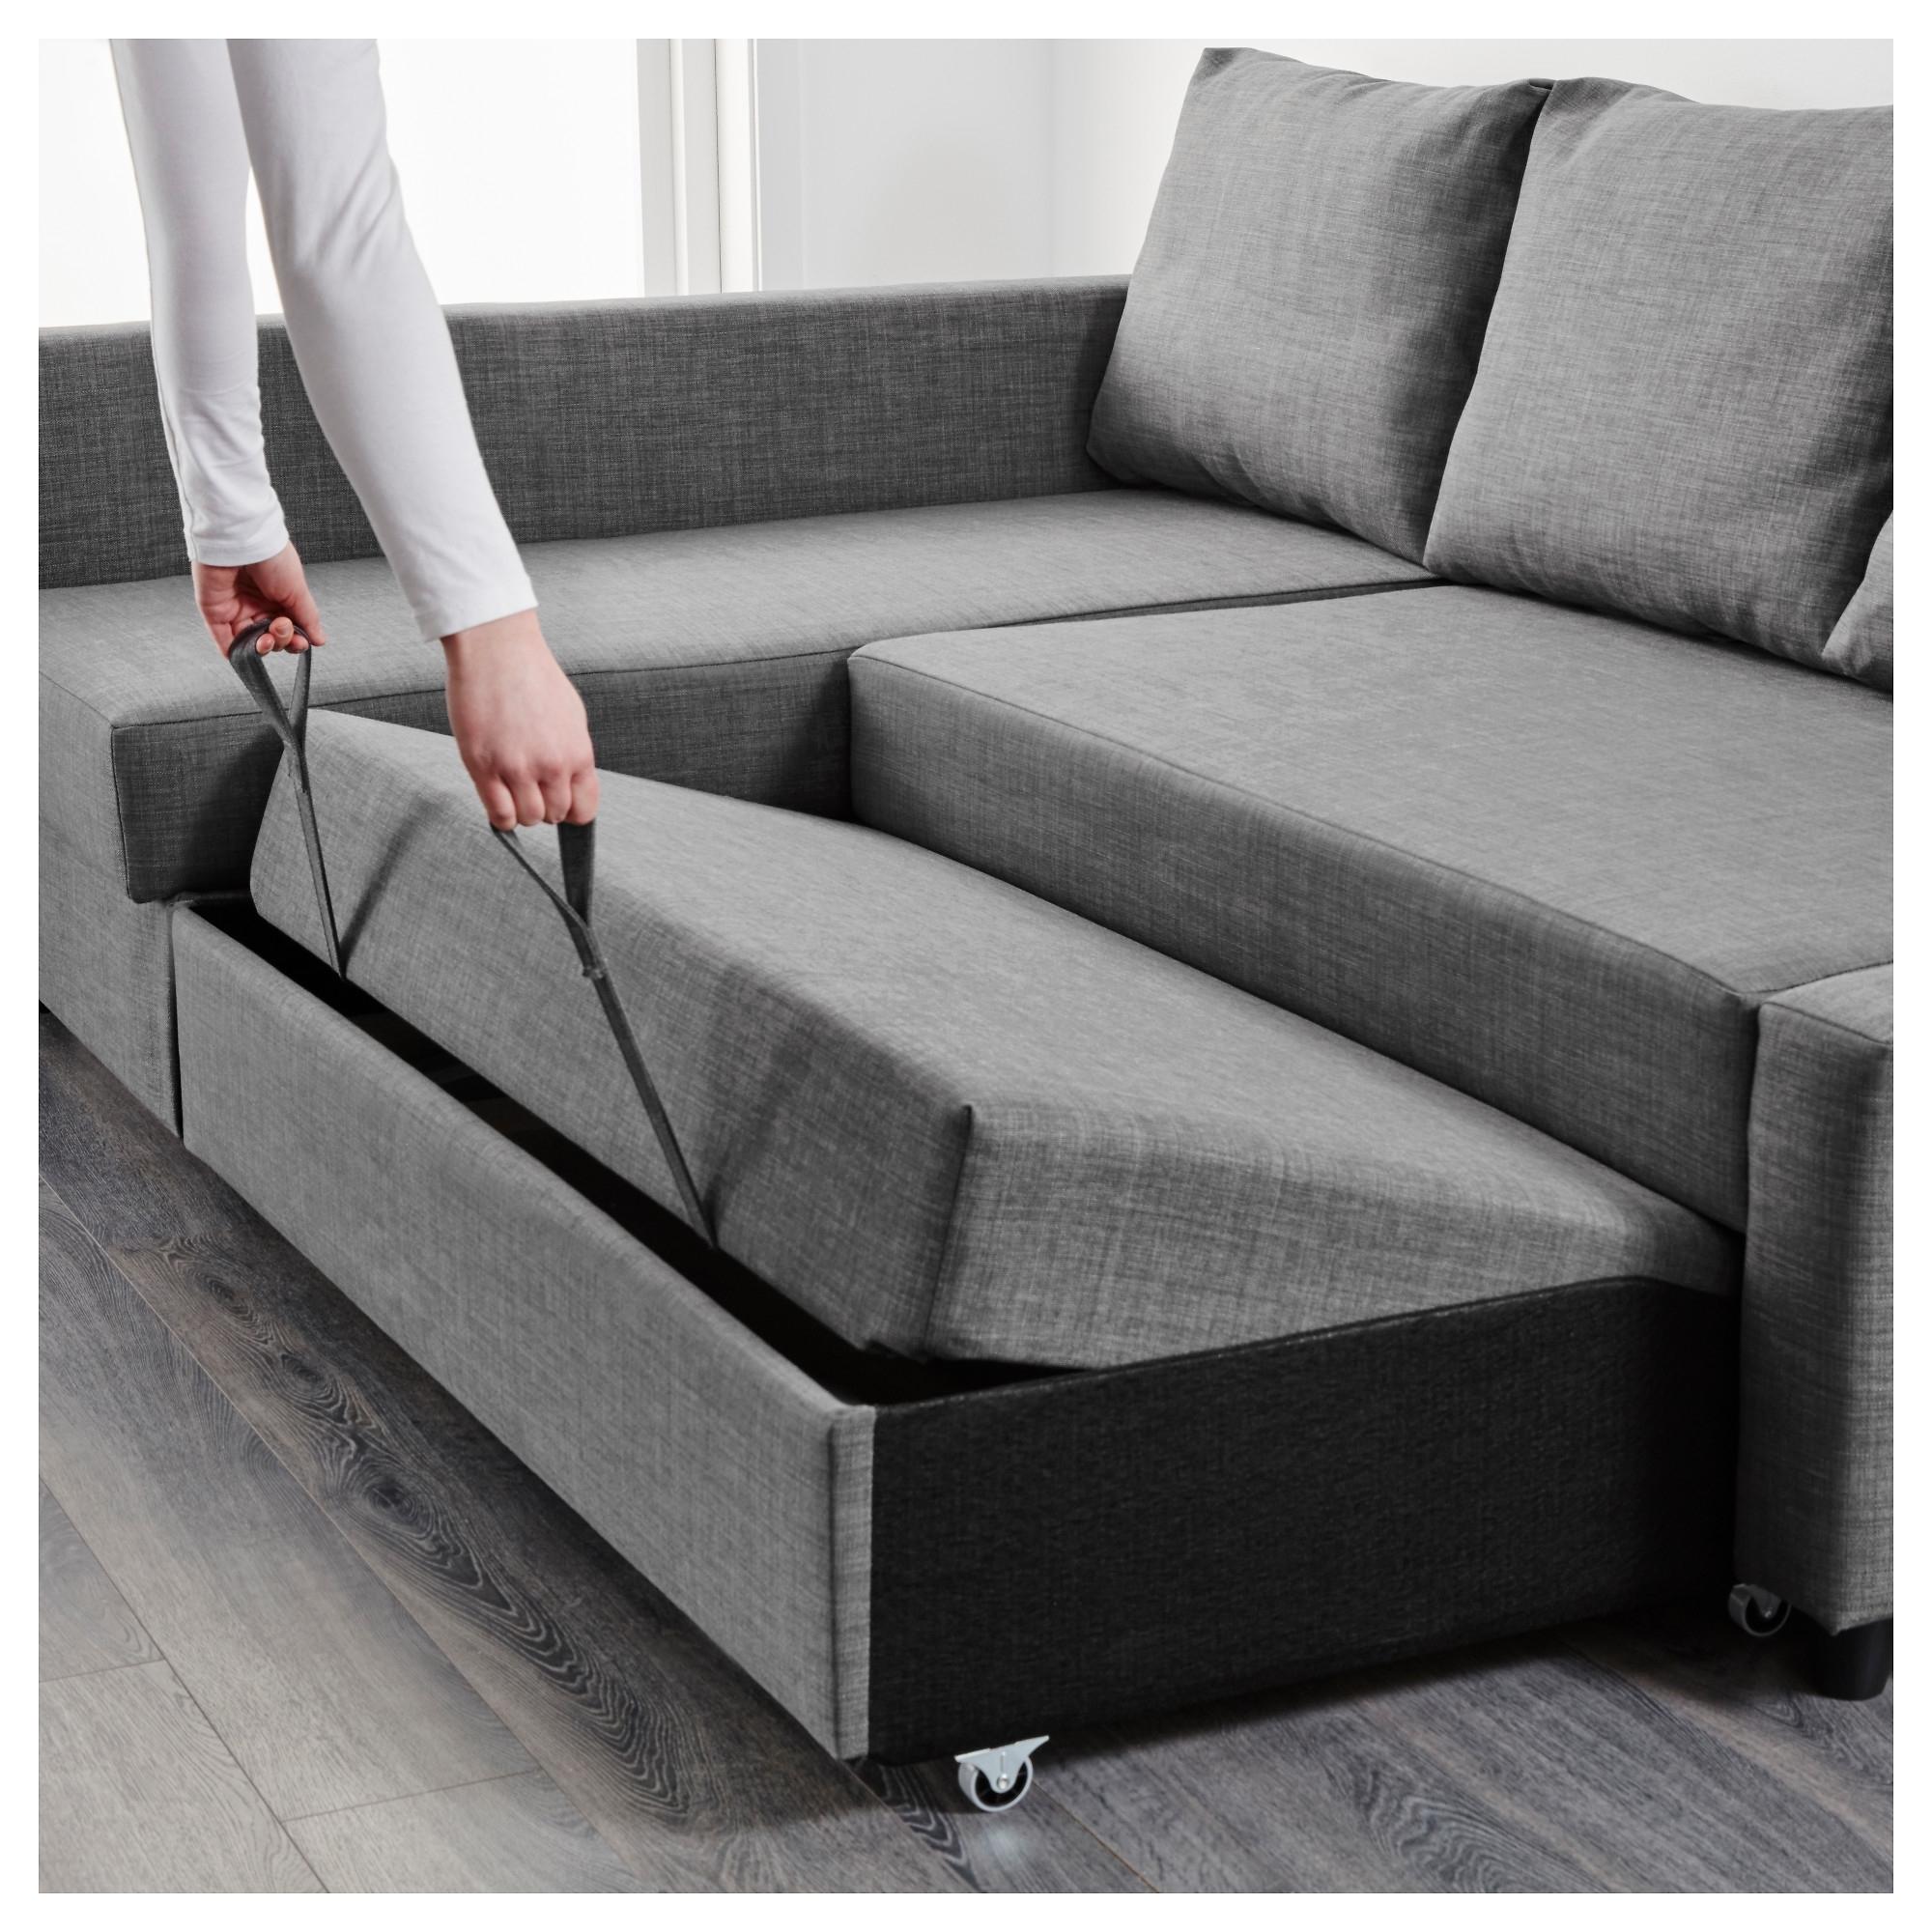 Friheten Sleeper Sectional,3 Seat W/storage – Skiftebo Beige – Ikea With Ikea Sectional Sleeper Sofas (Image 4 of 10)